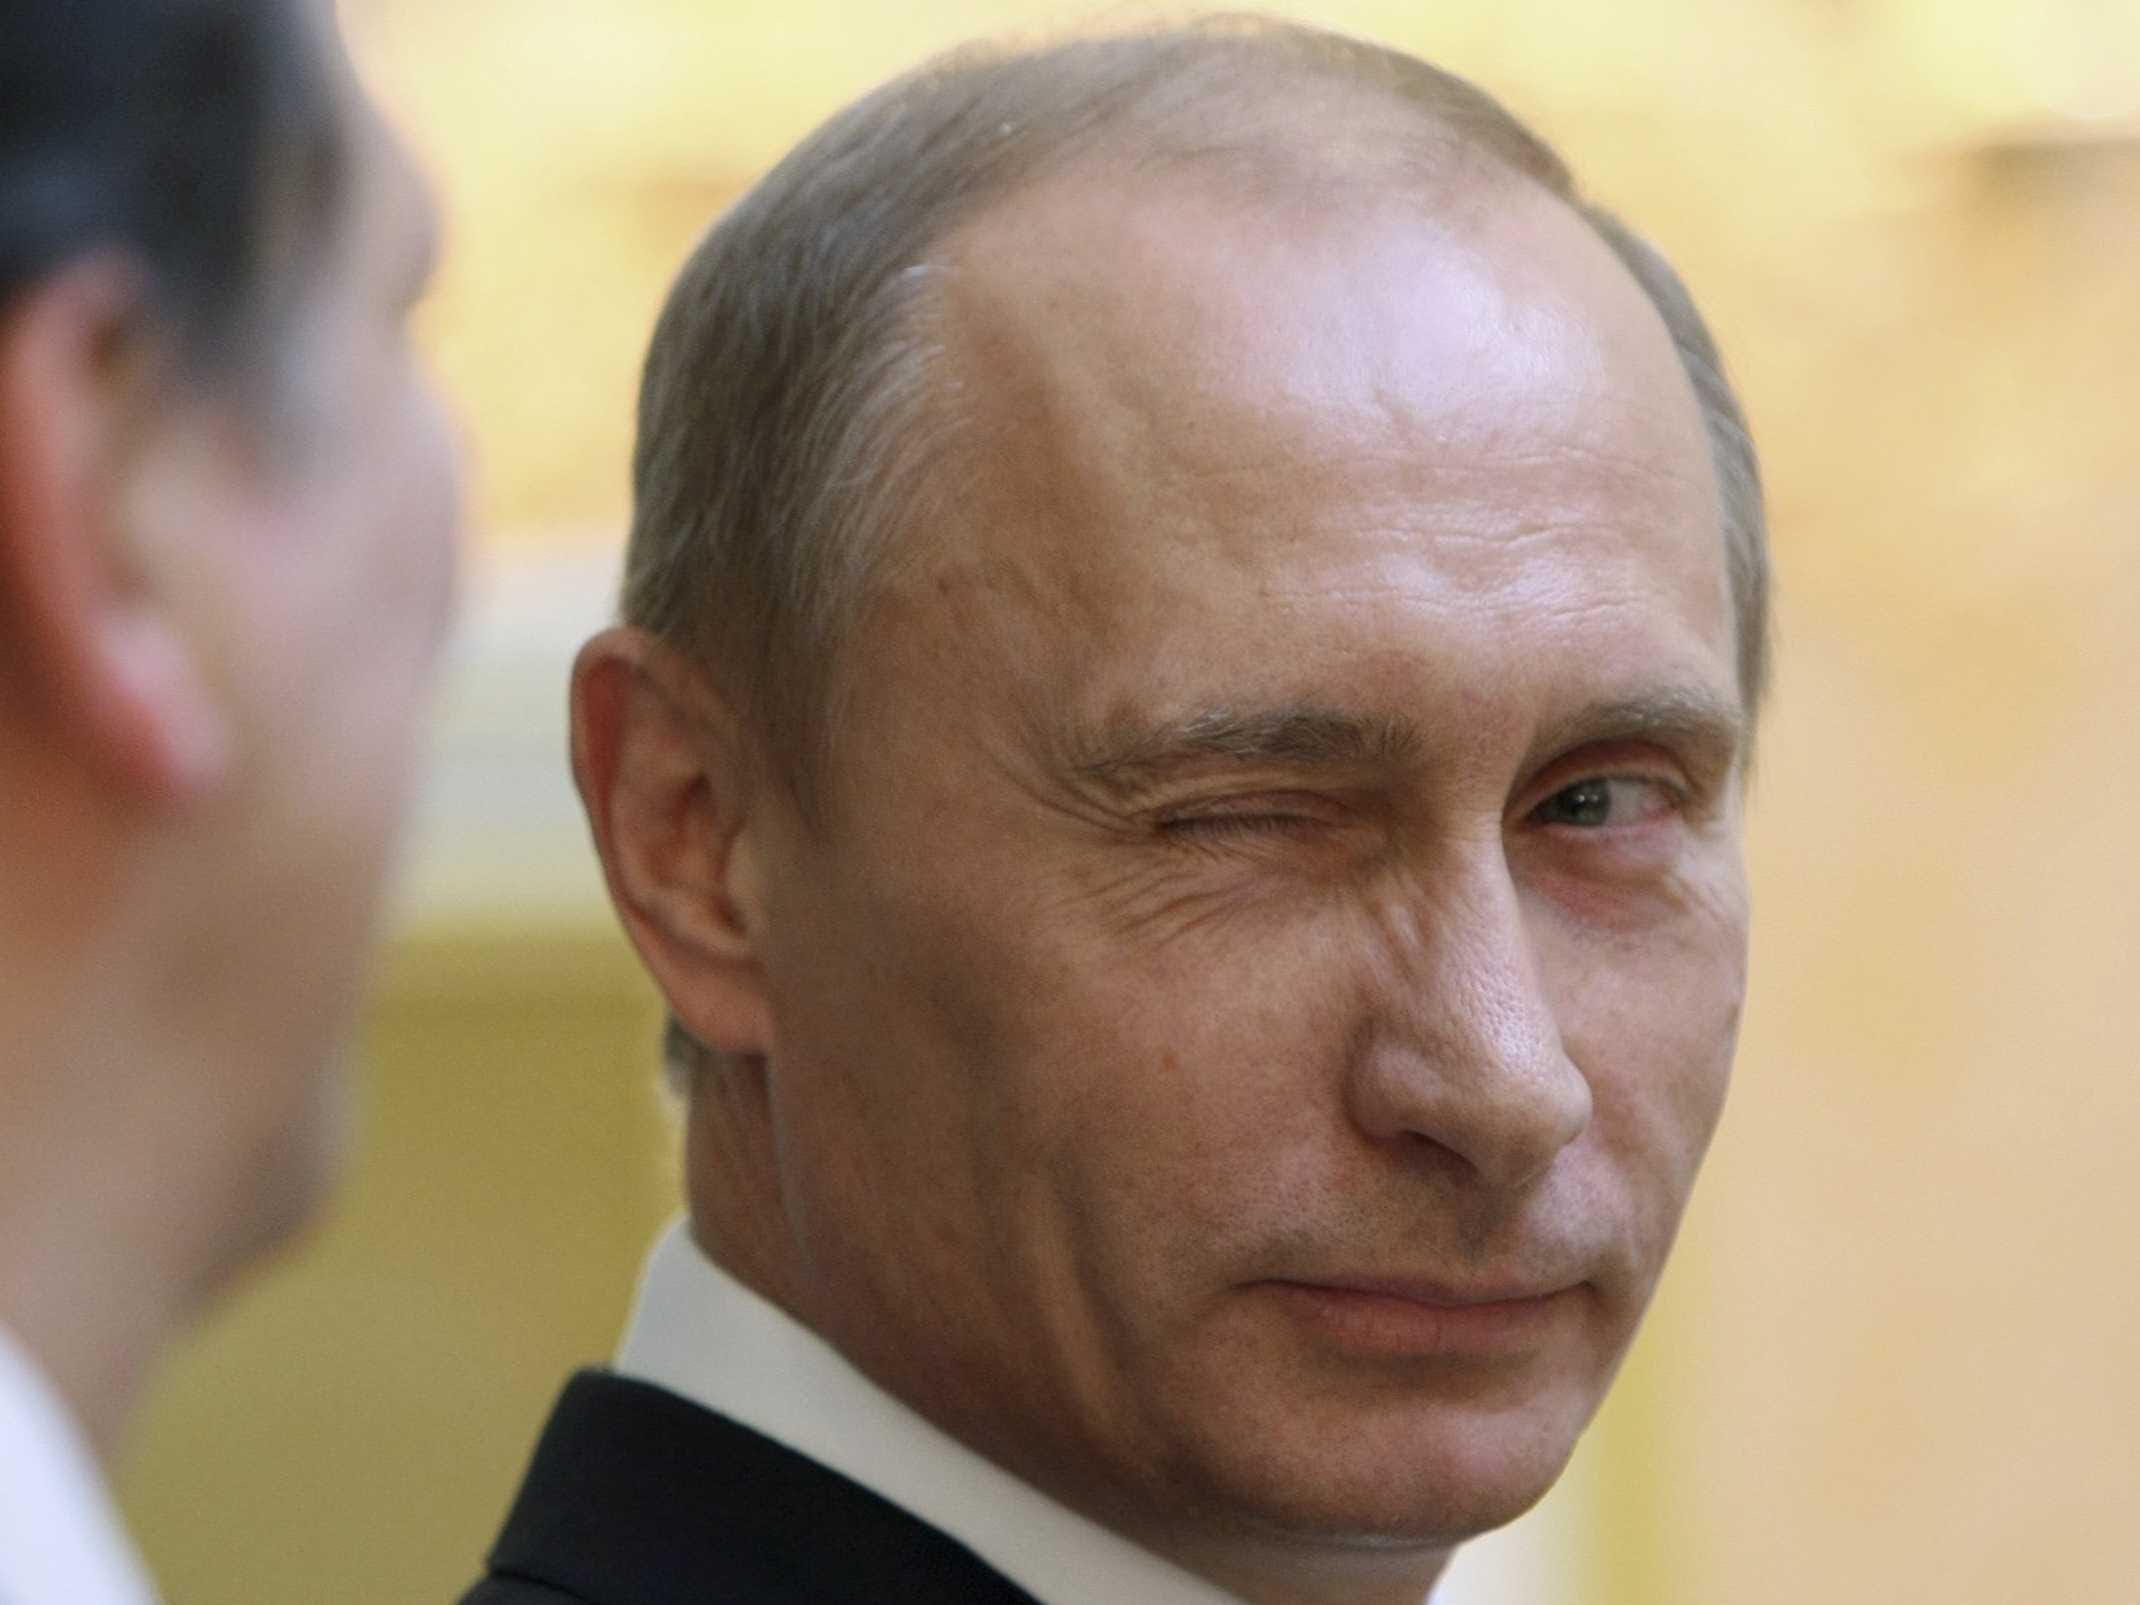 http://www.strengthfighter.com/2014/05/alexander-rusev-ukraine-russian-scandal.html